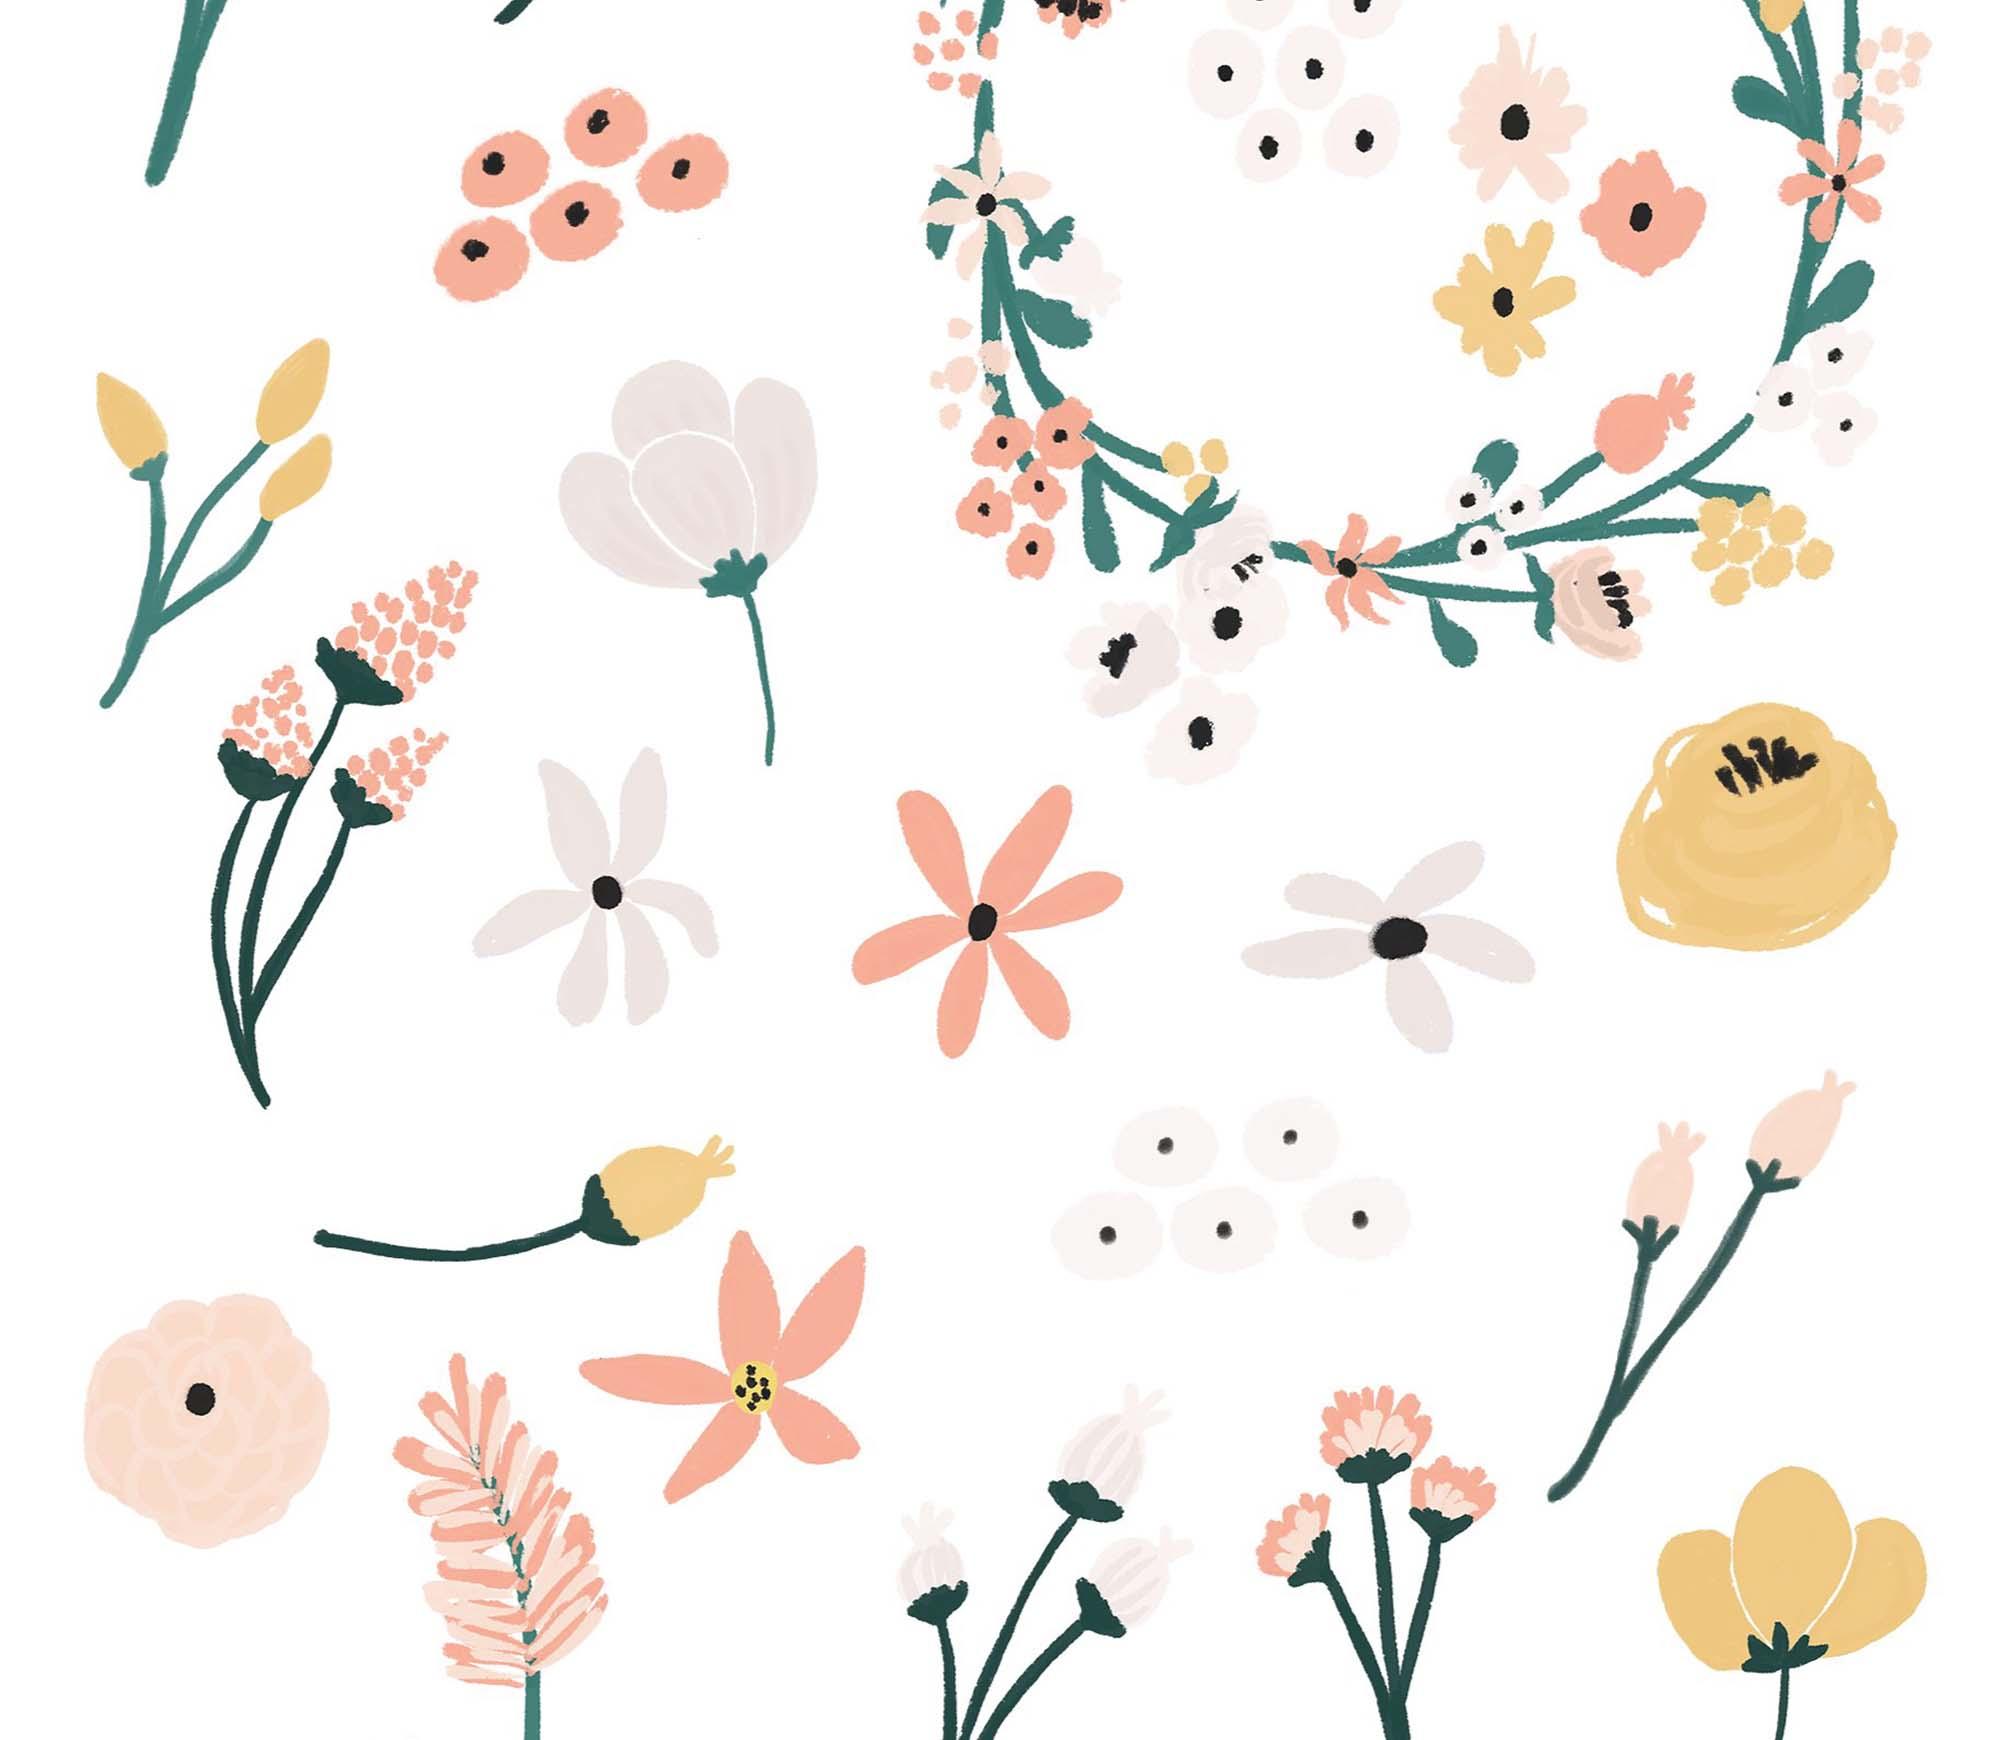 Lillia Floral Illustrations 6